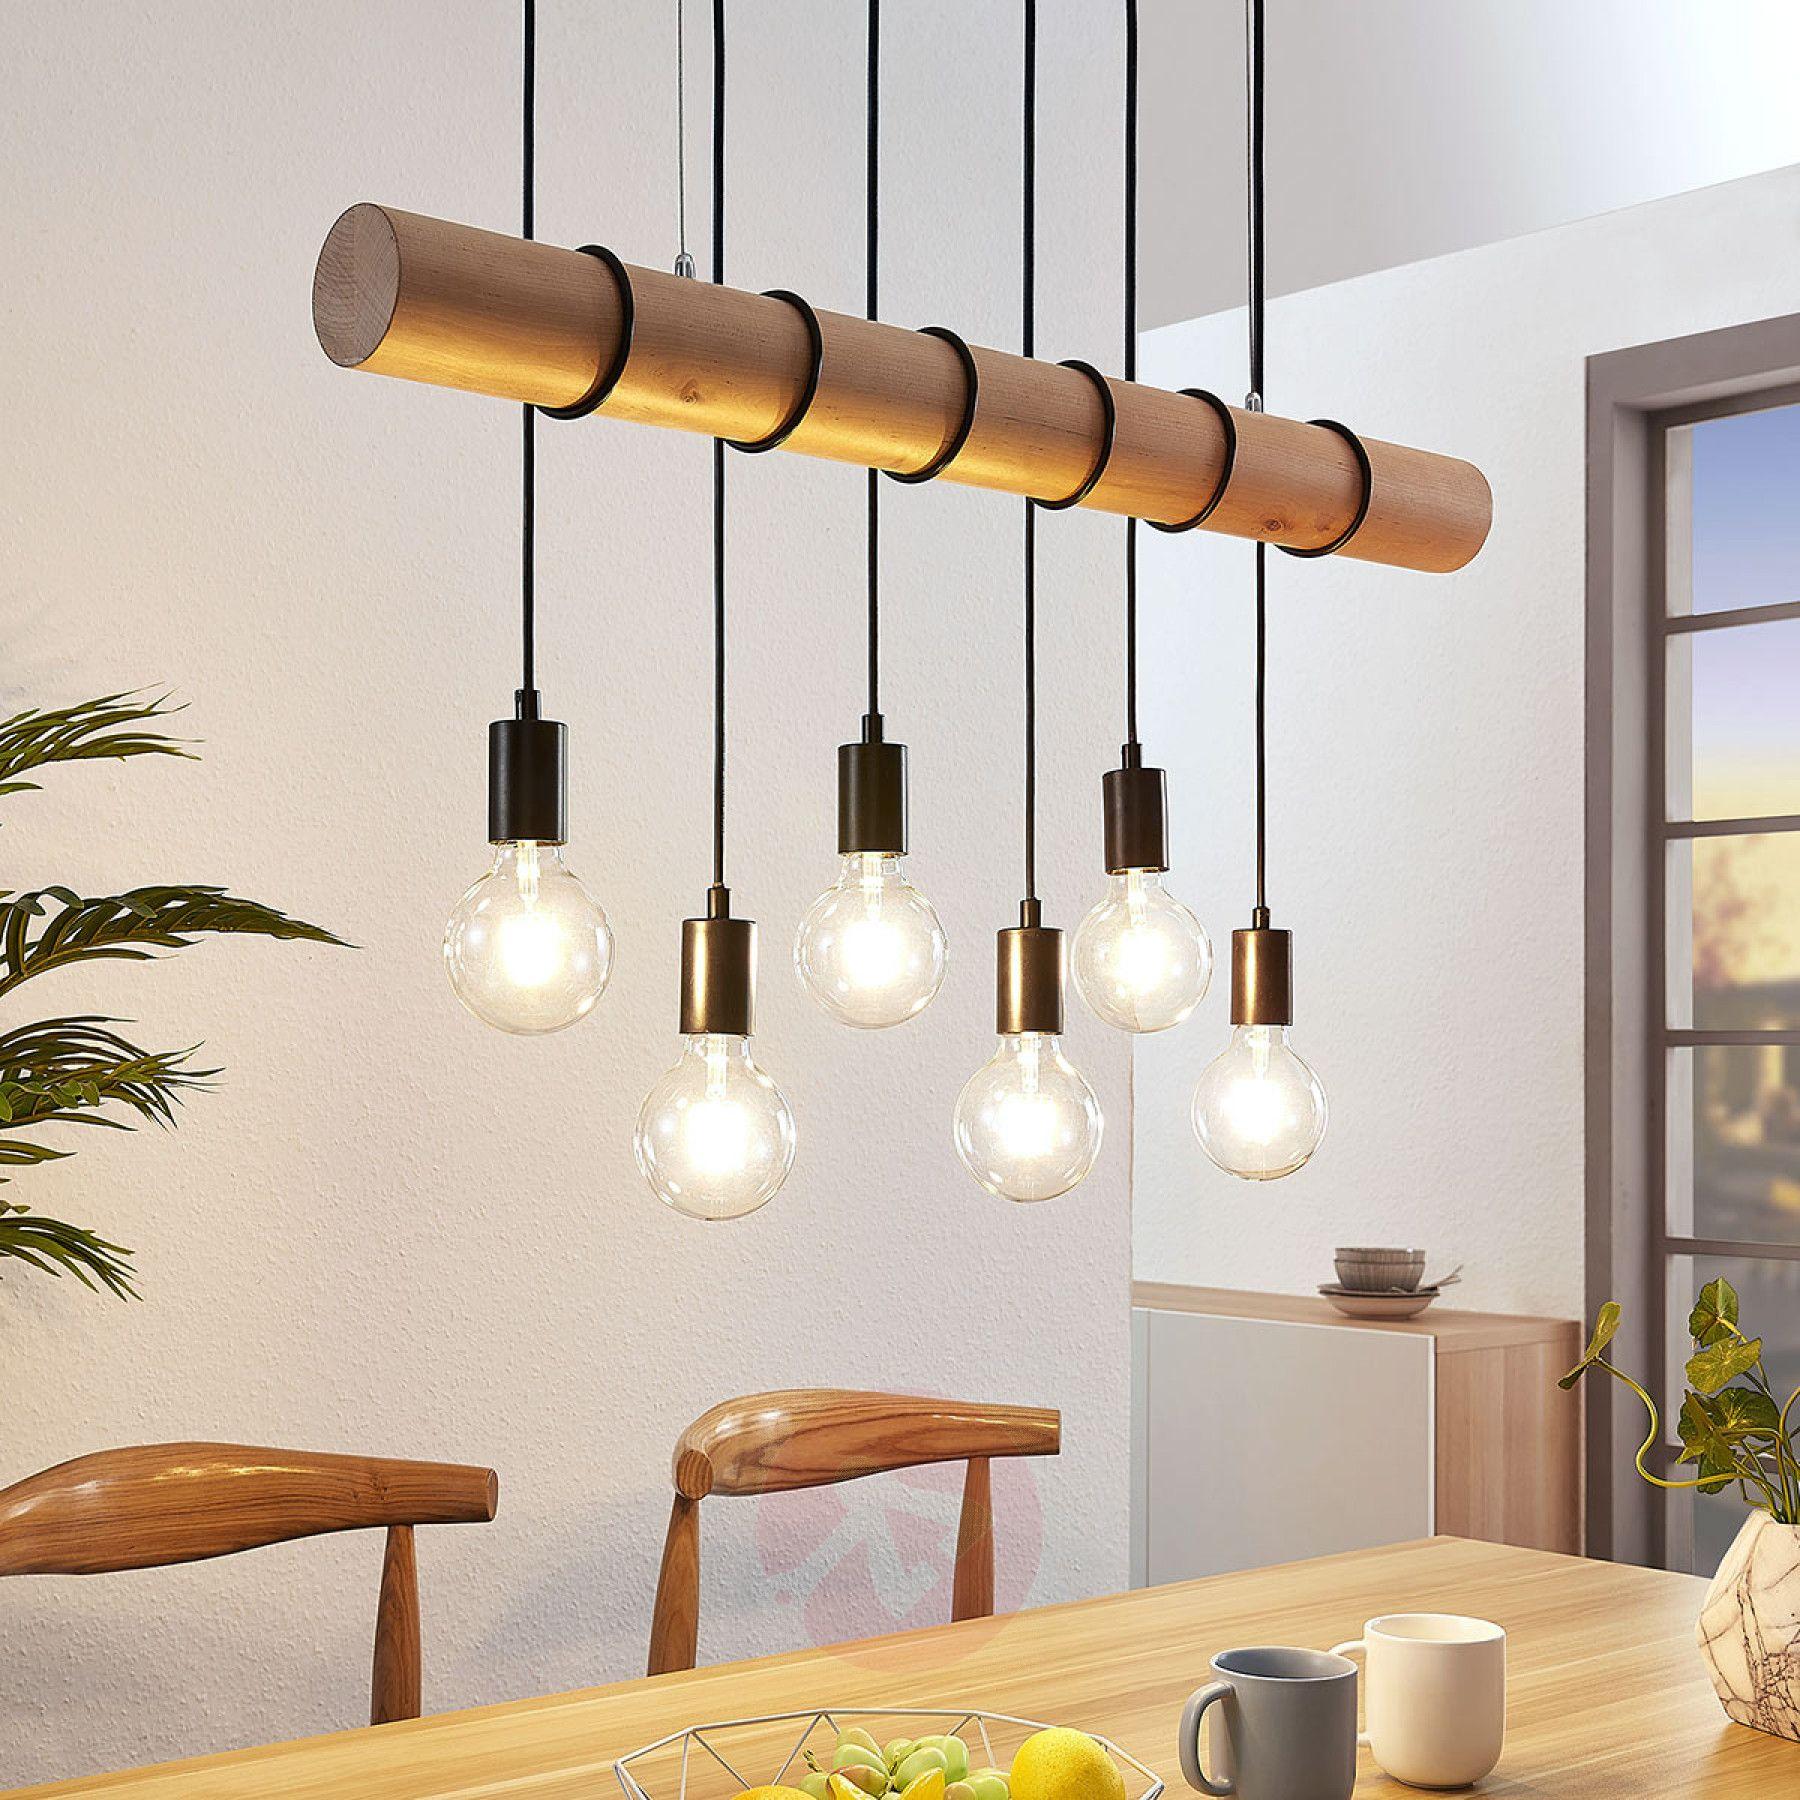 Drewniana lampa wisząca Eviton, 6 pkt. naturalna   Wooden